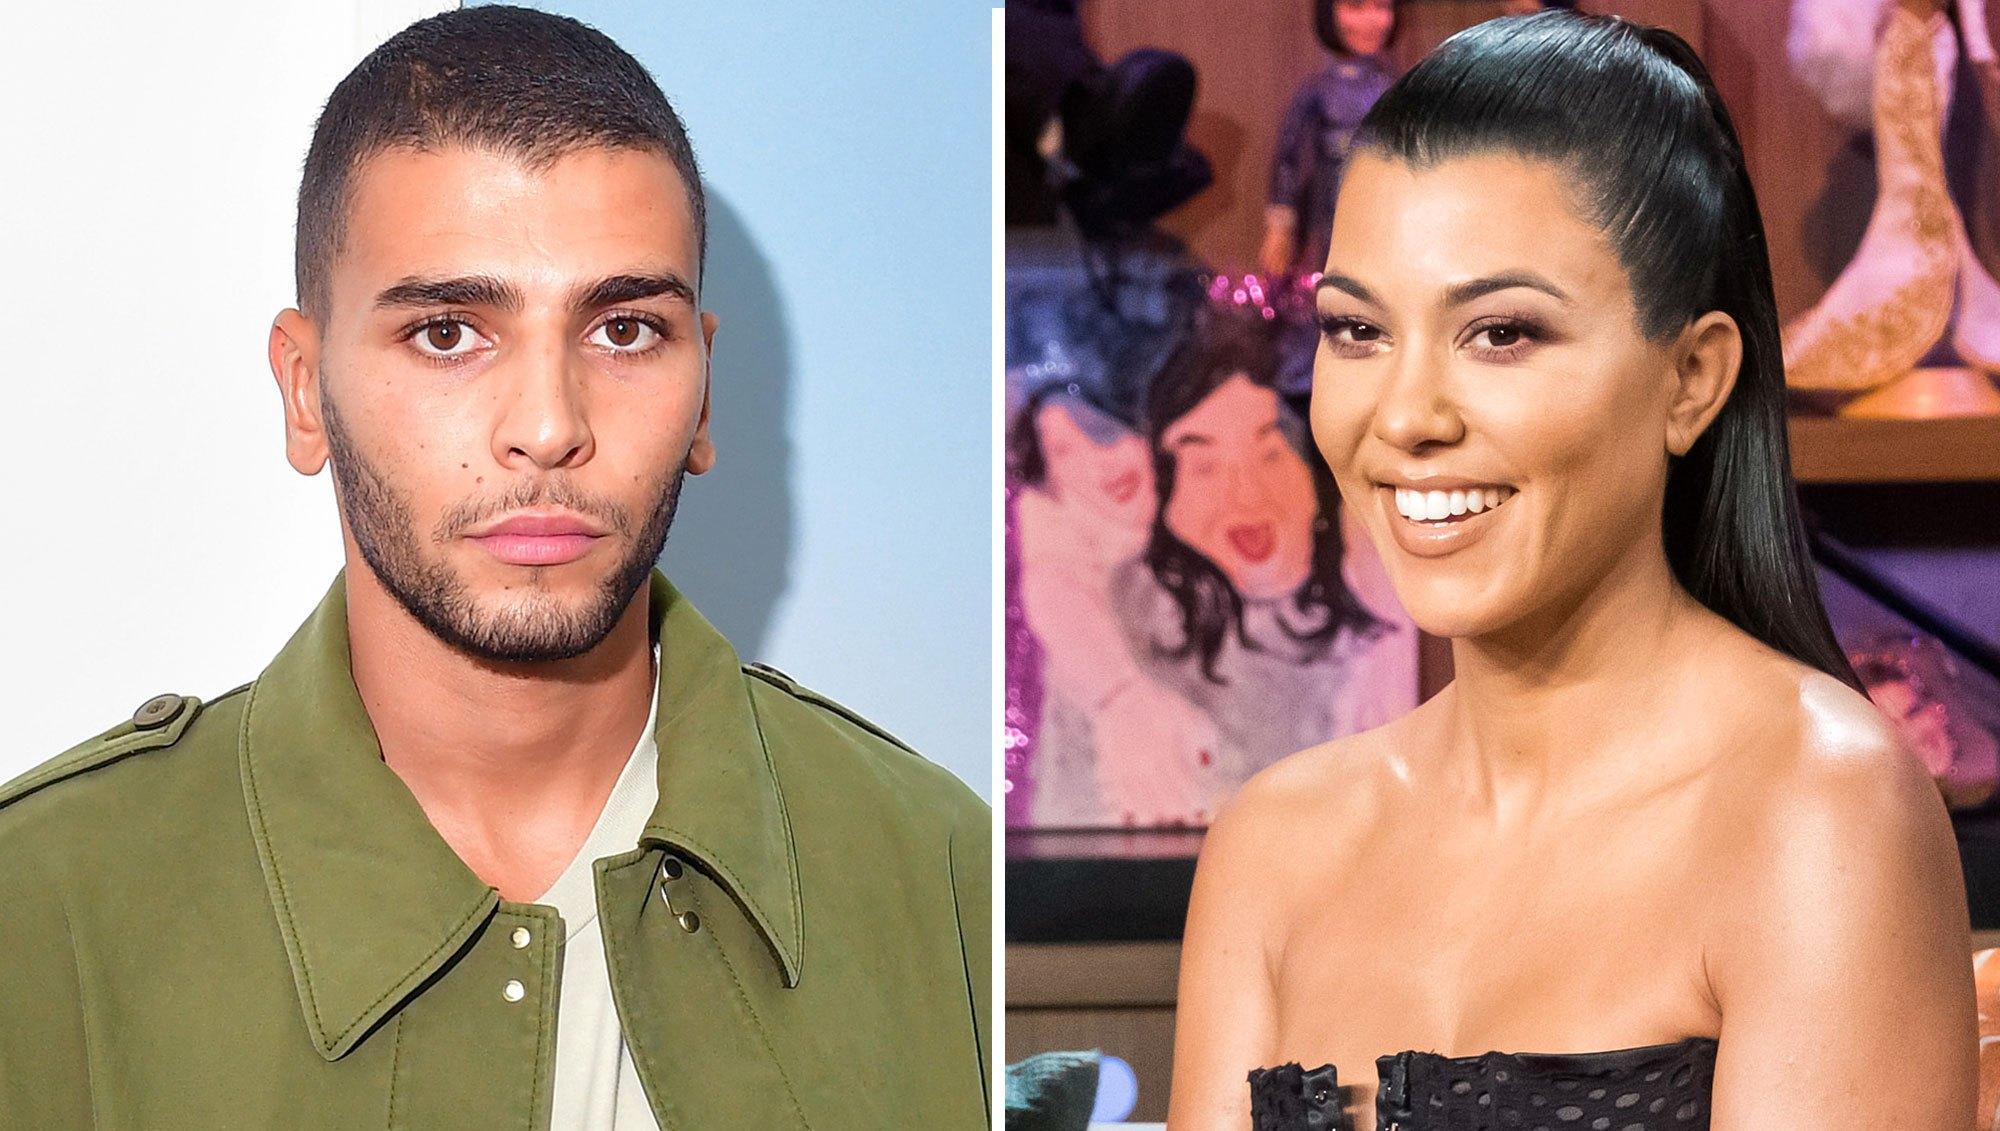 Younes Bendjima and Kourtney Kardashian Exchange Flirty Messages on Instagram